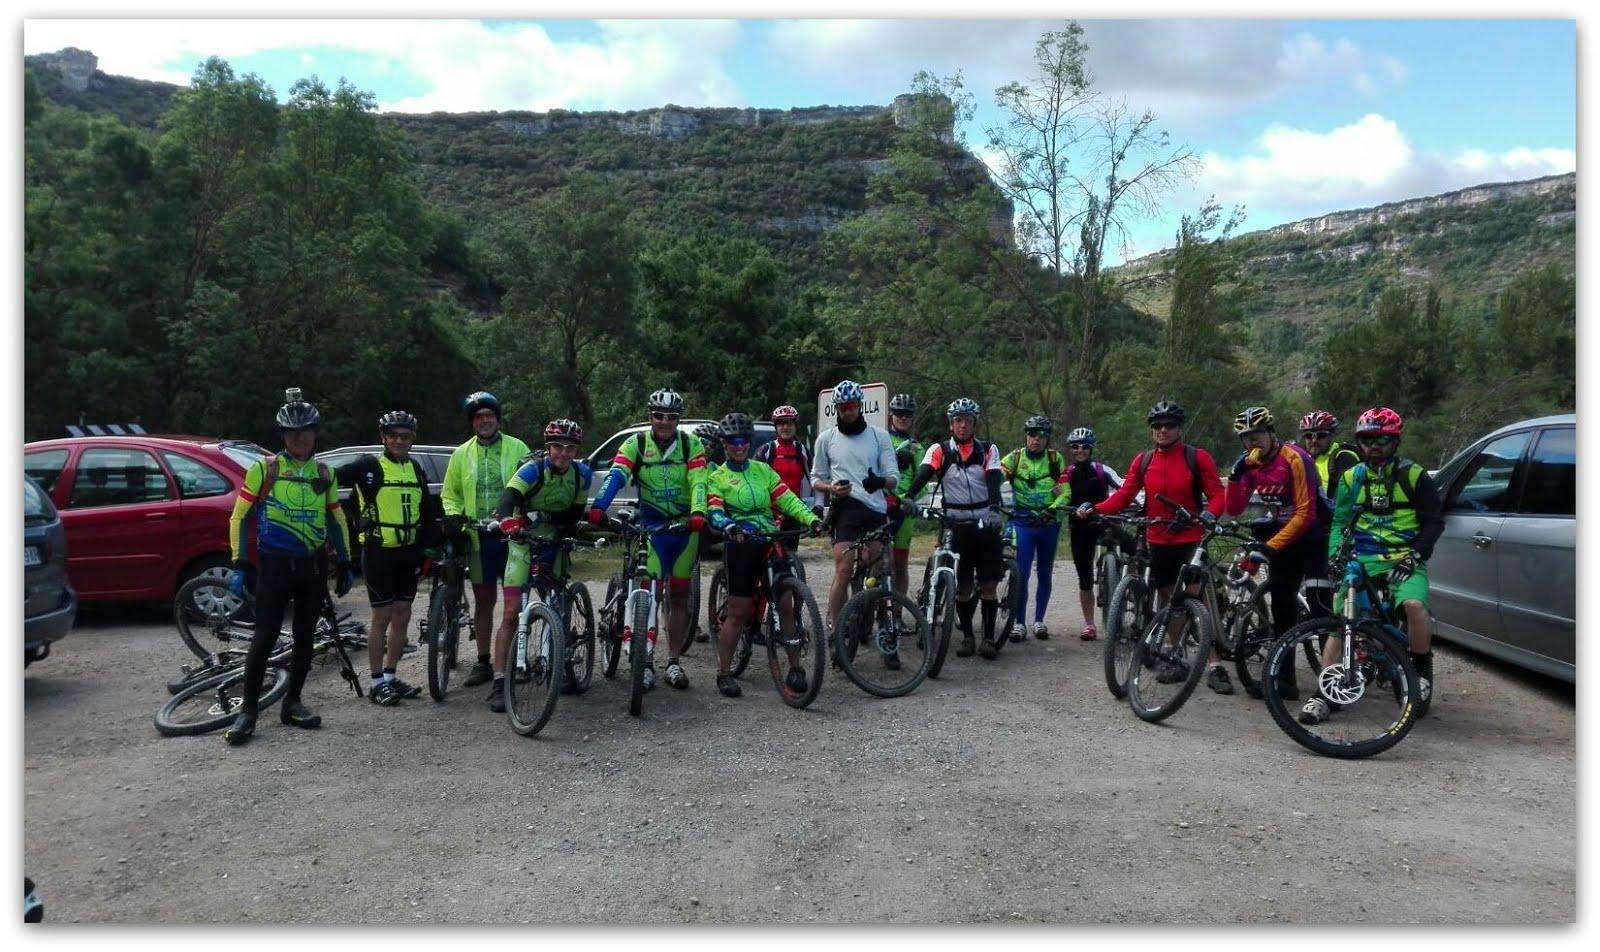 Marcha a Cañón del Ebro.29.05.2016. Primera parte